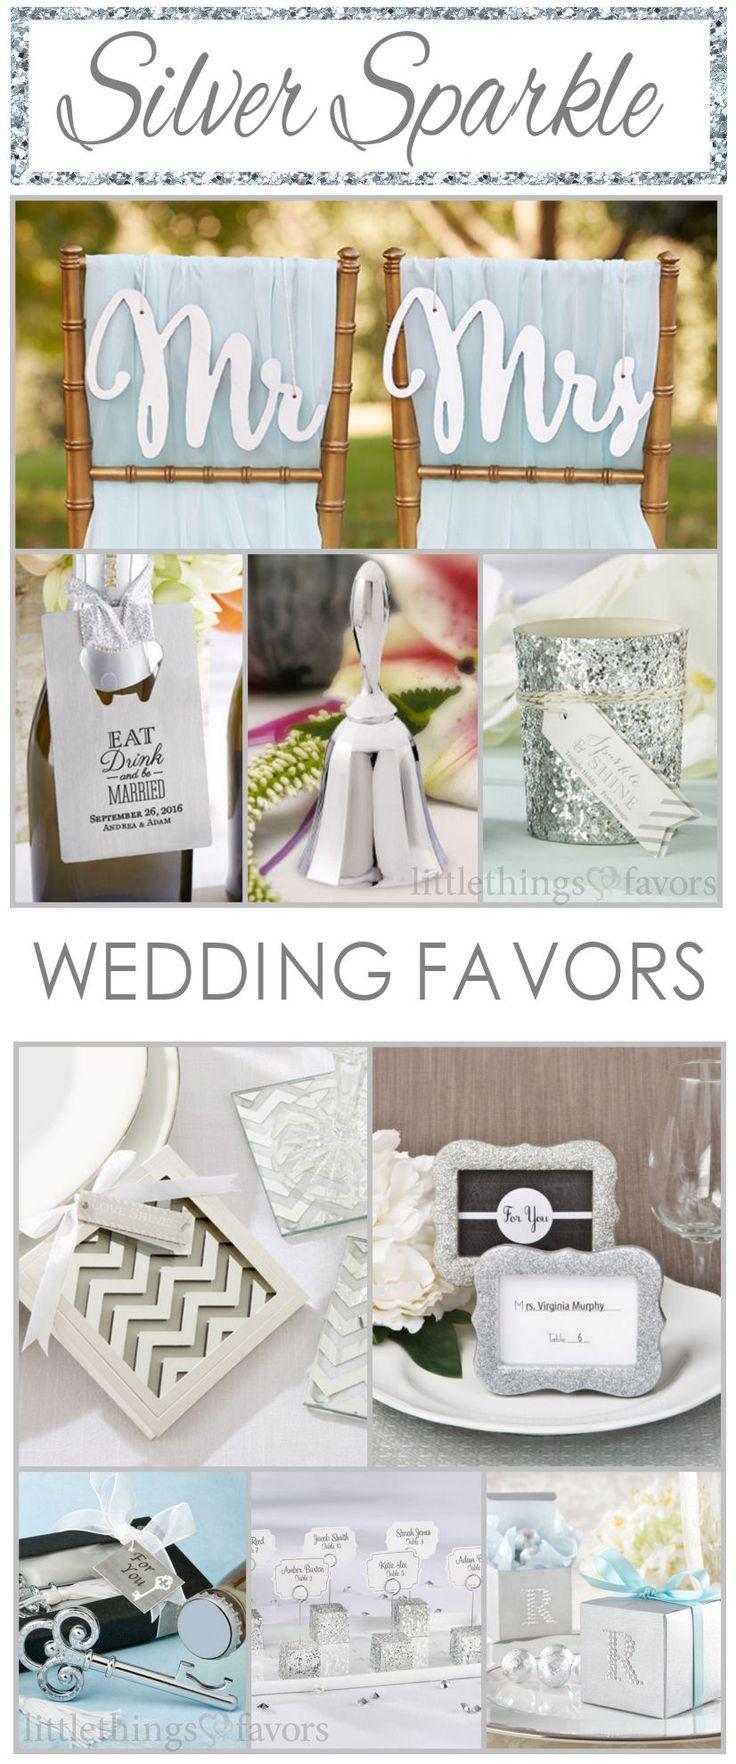 Over 100 Silver Wedding Theme Ideas + Wedding Favors! #WeddingIdeas #SilverWeddingIdeas #SilverWeddingFavors